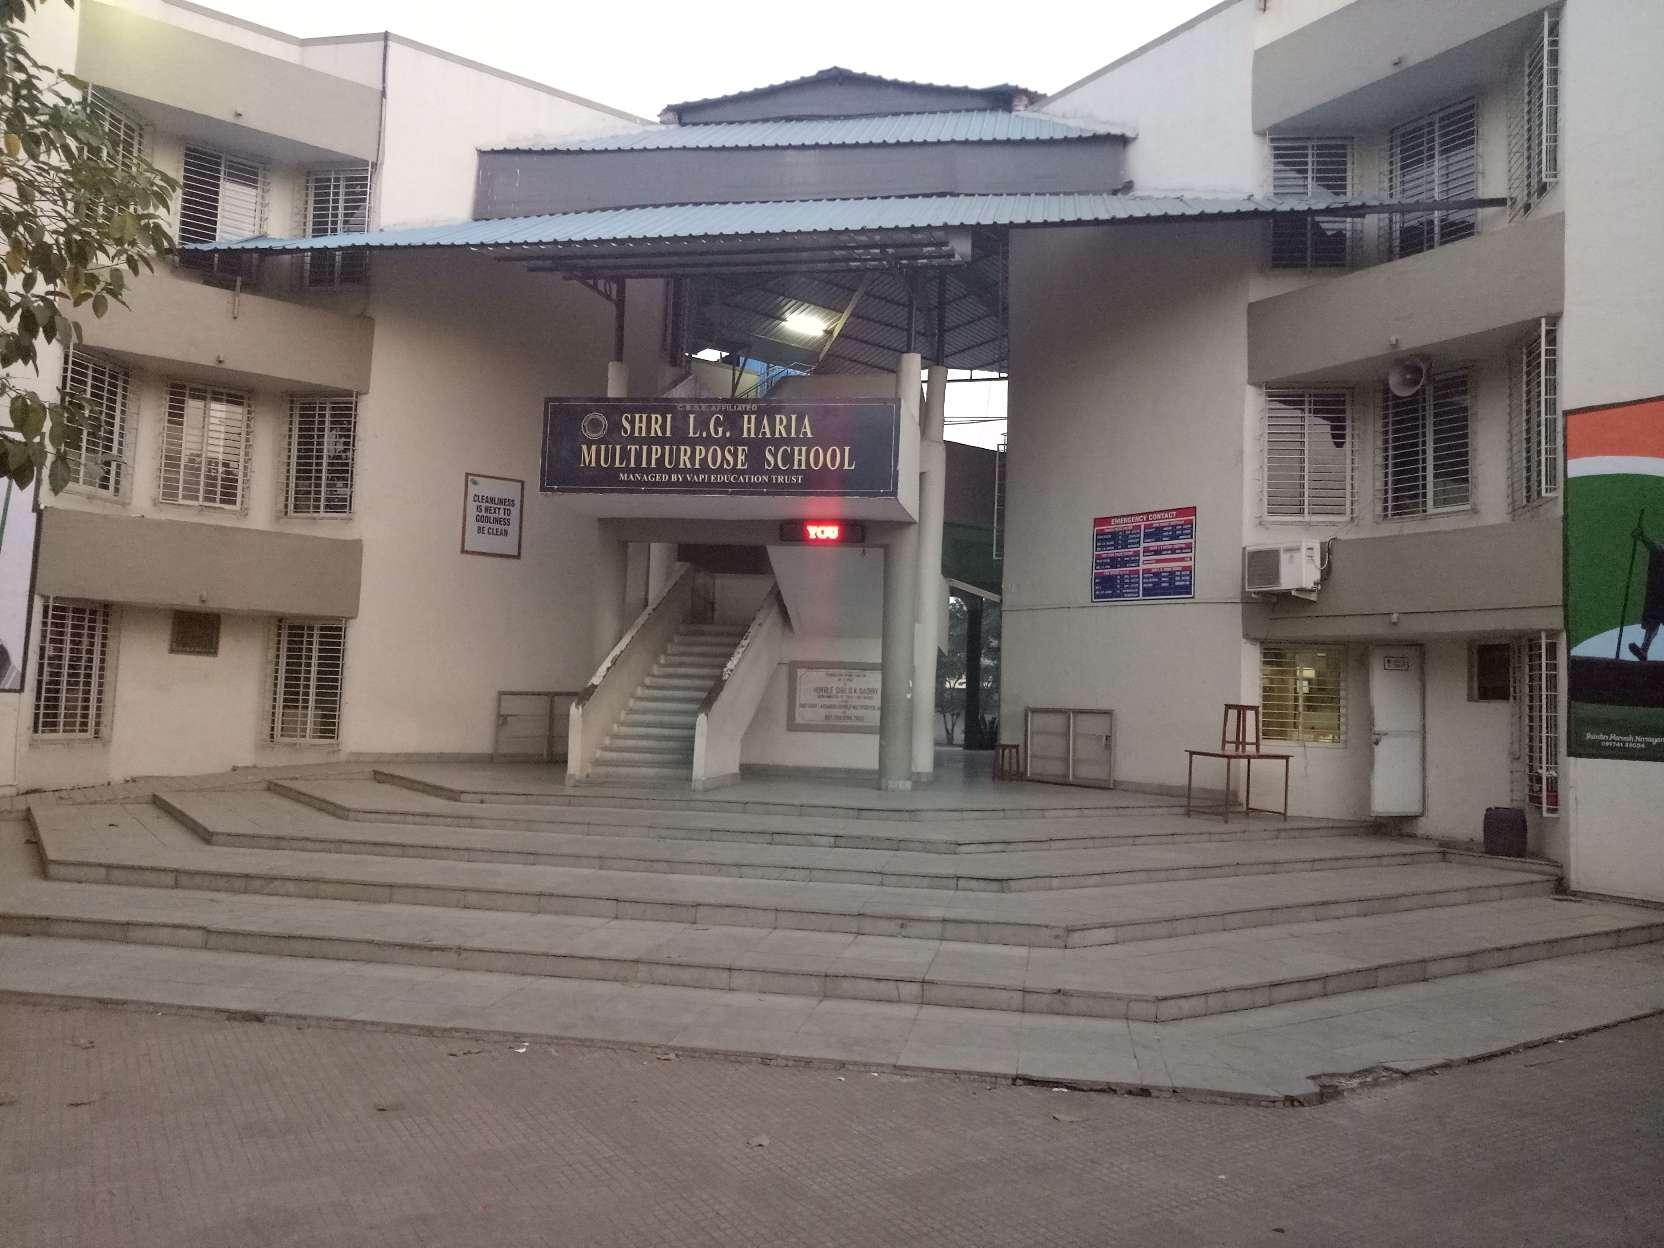 Shri L G Haria Multipurpose School Haria Park Silvassa Road Dungra Via Vapi 396 195 430134